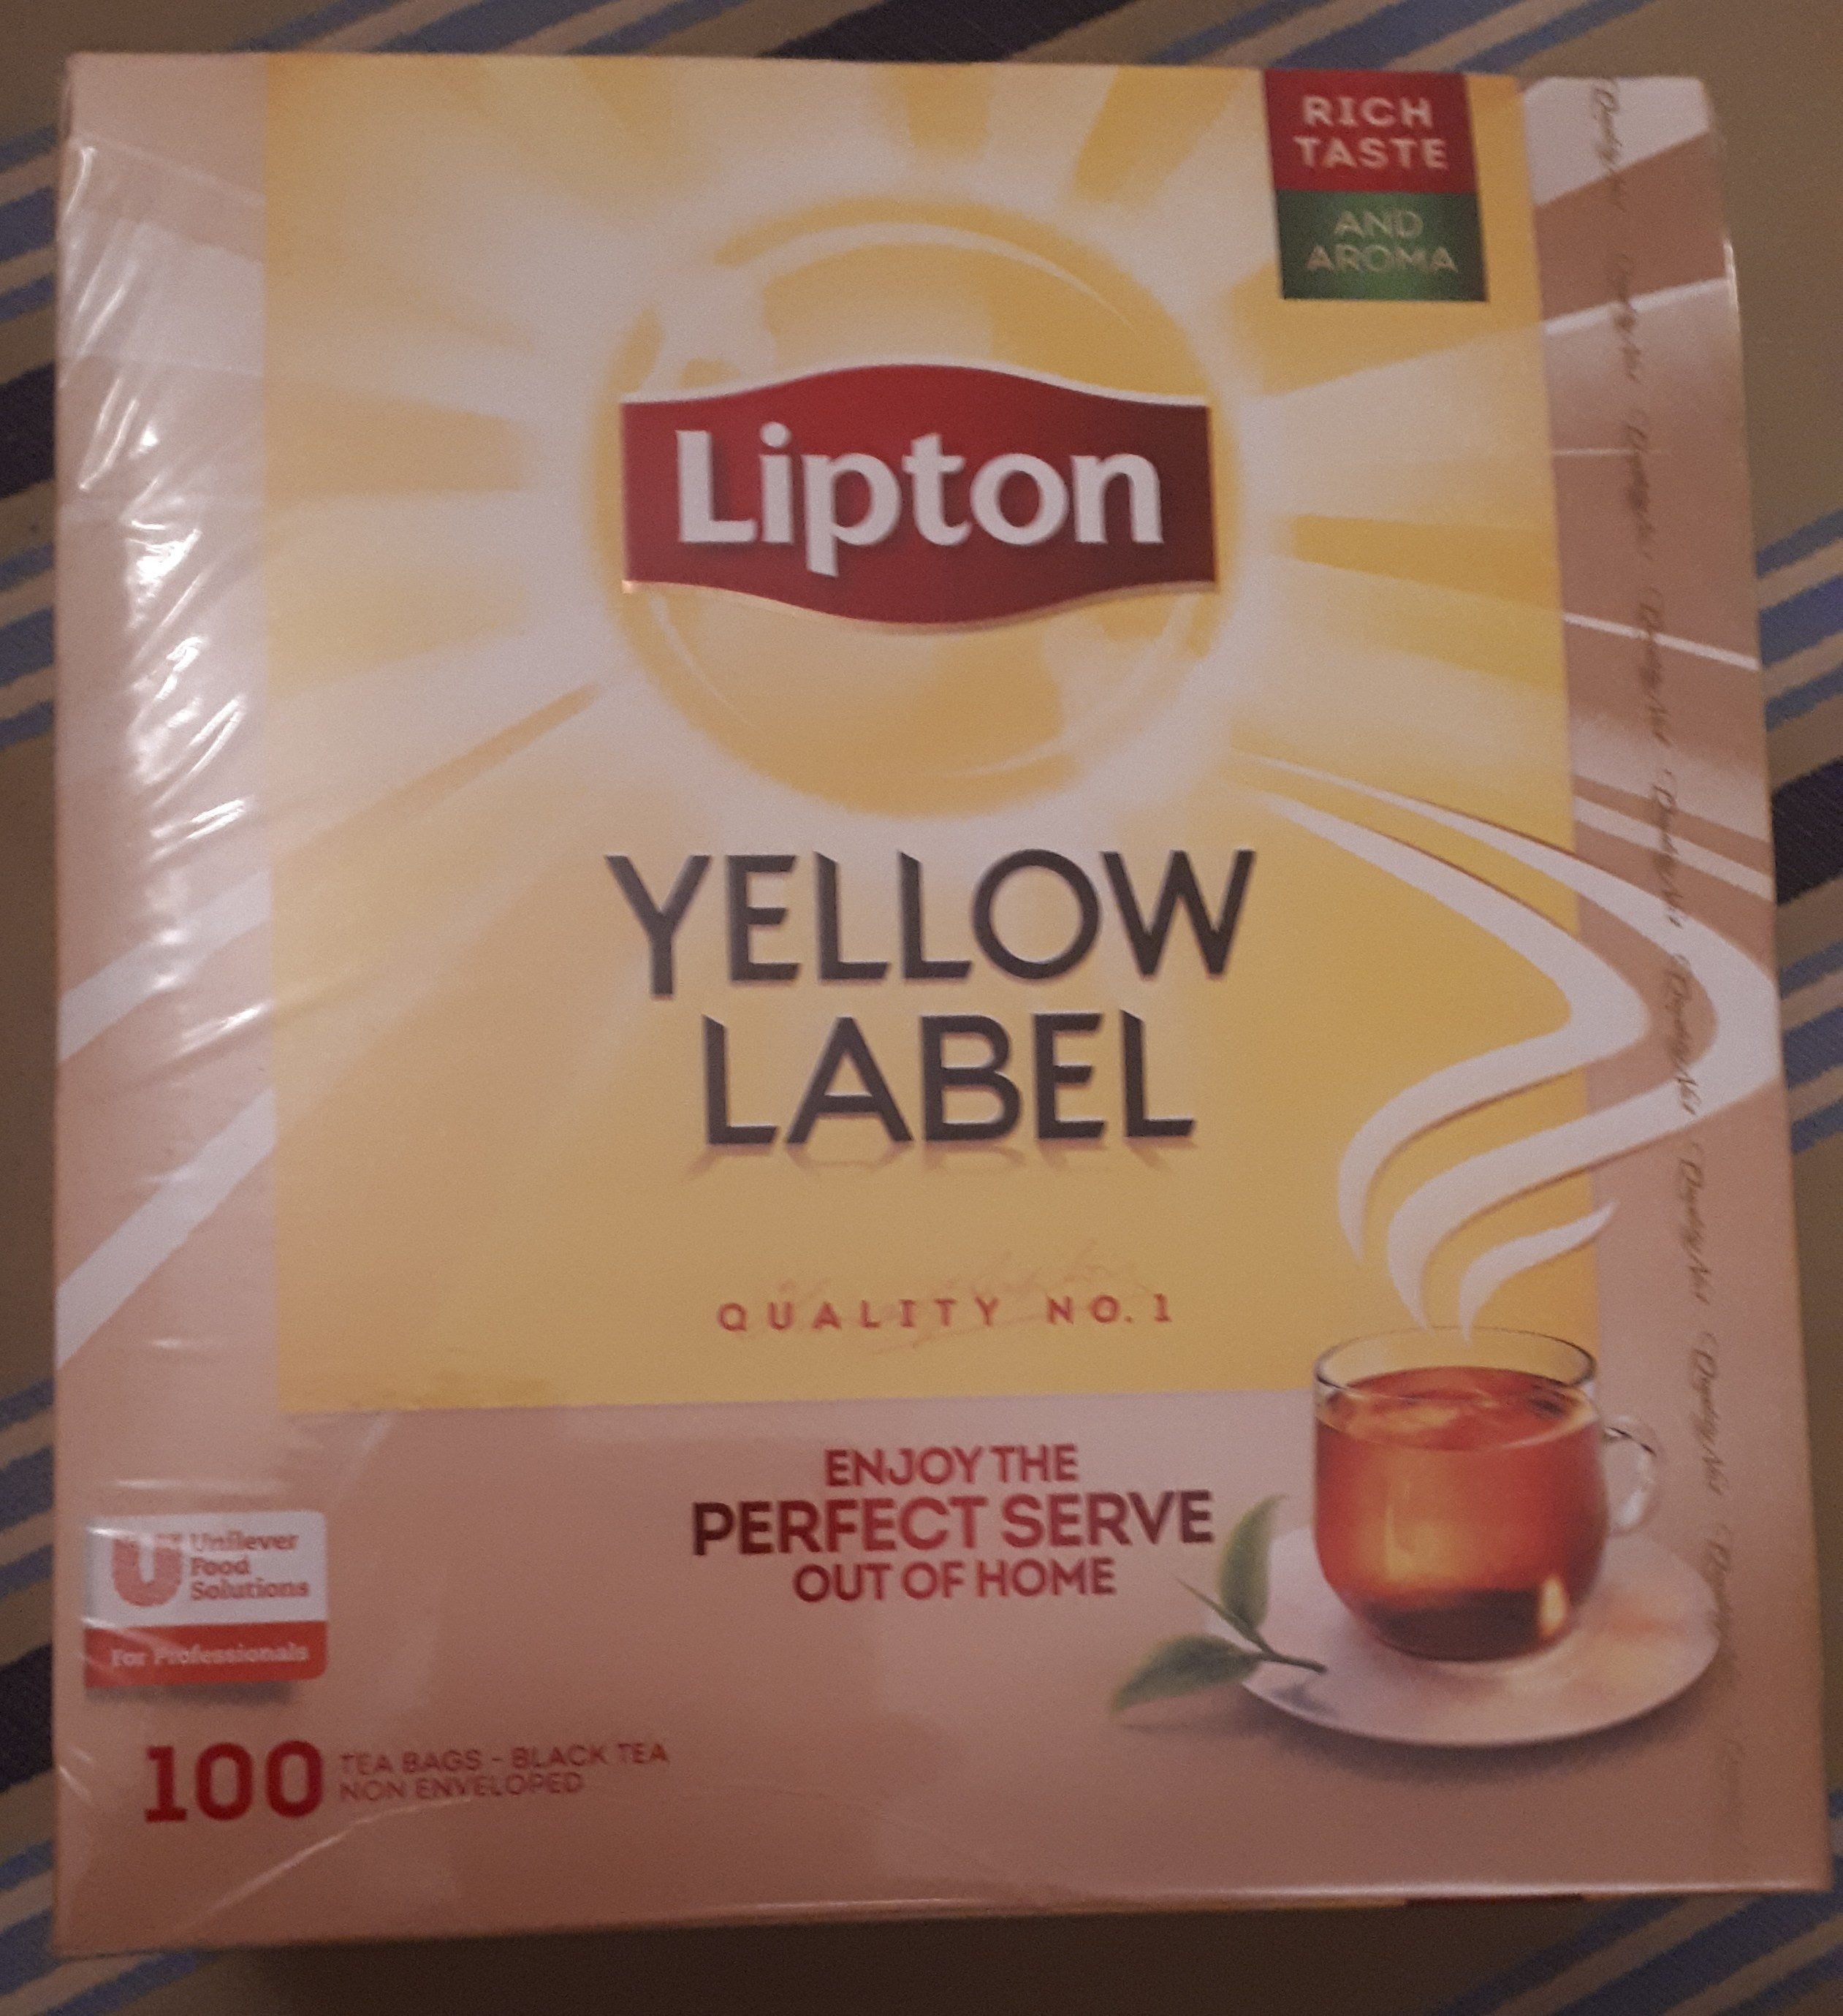 Lipton Yellow Label Tea - Product - en